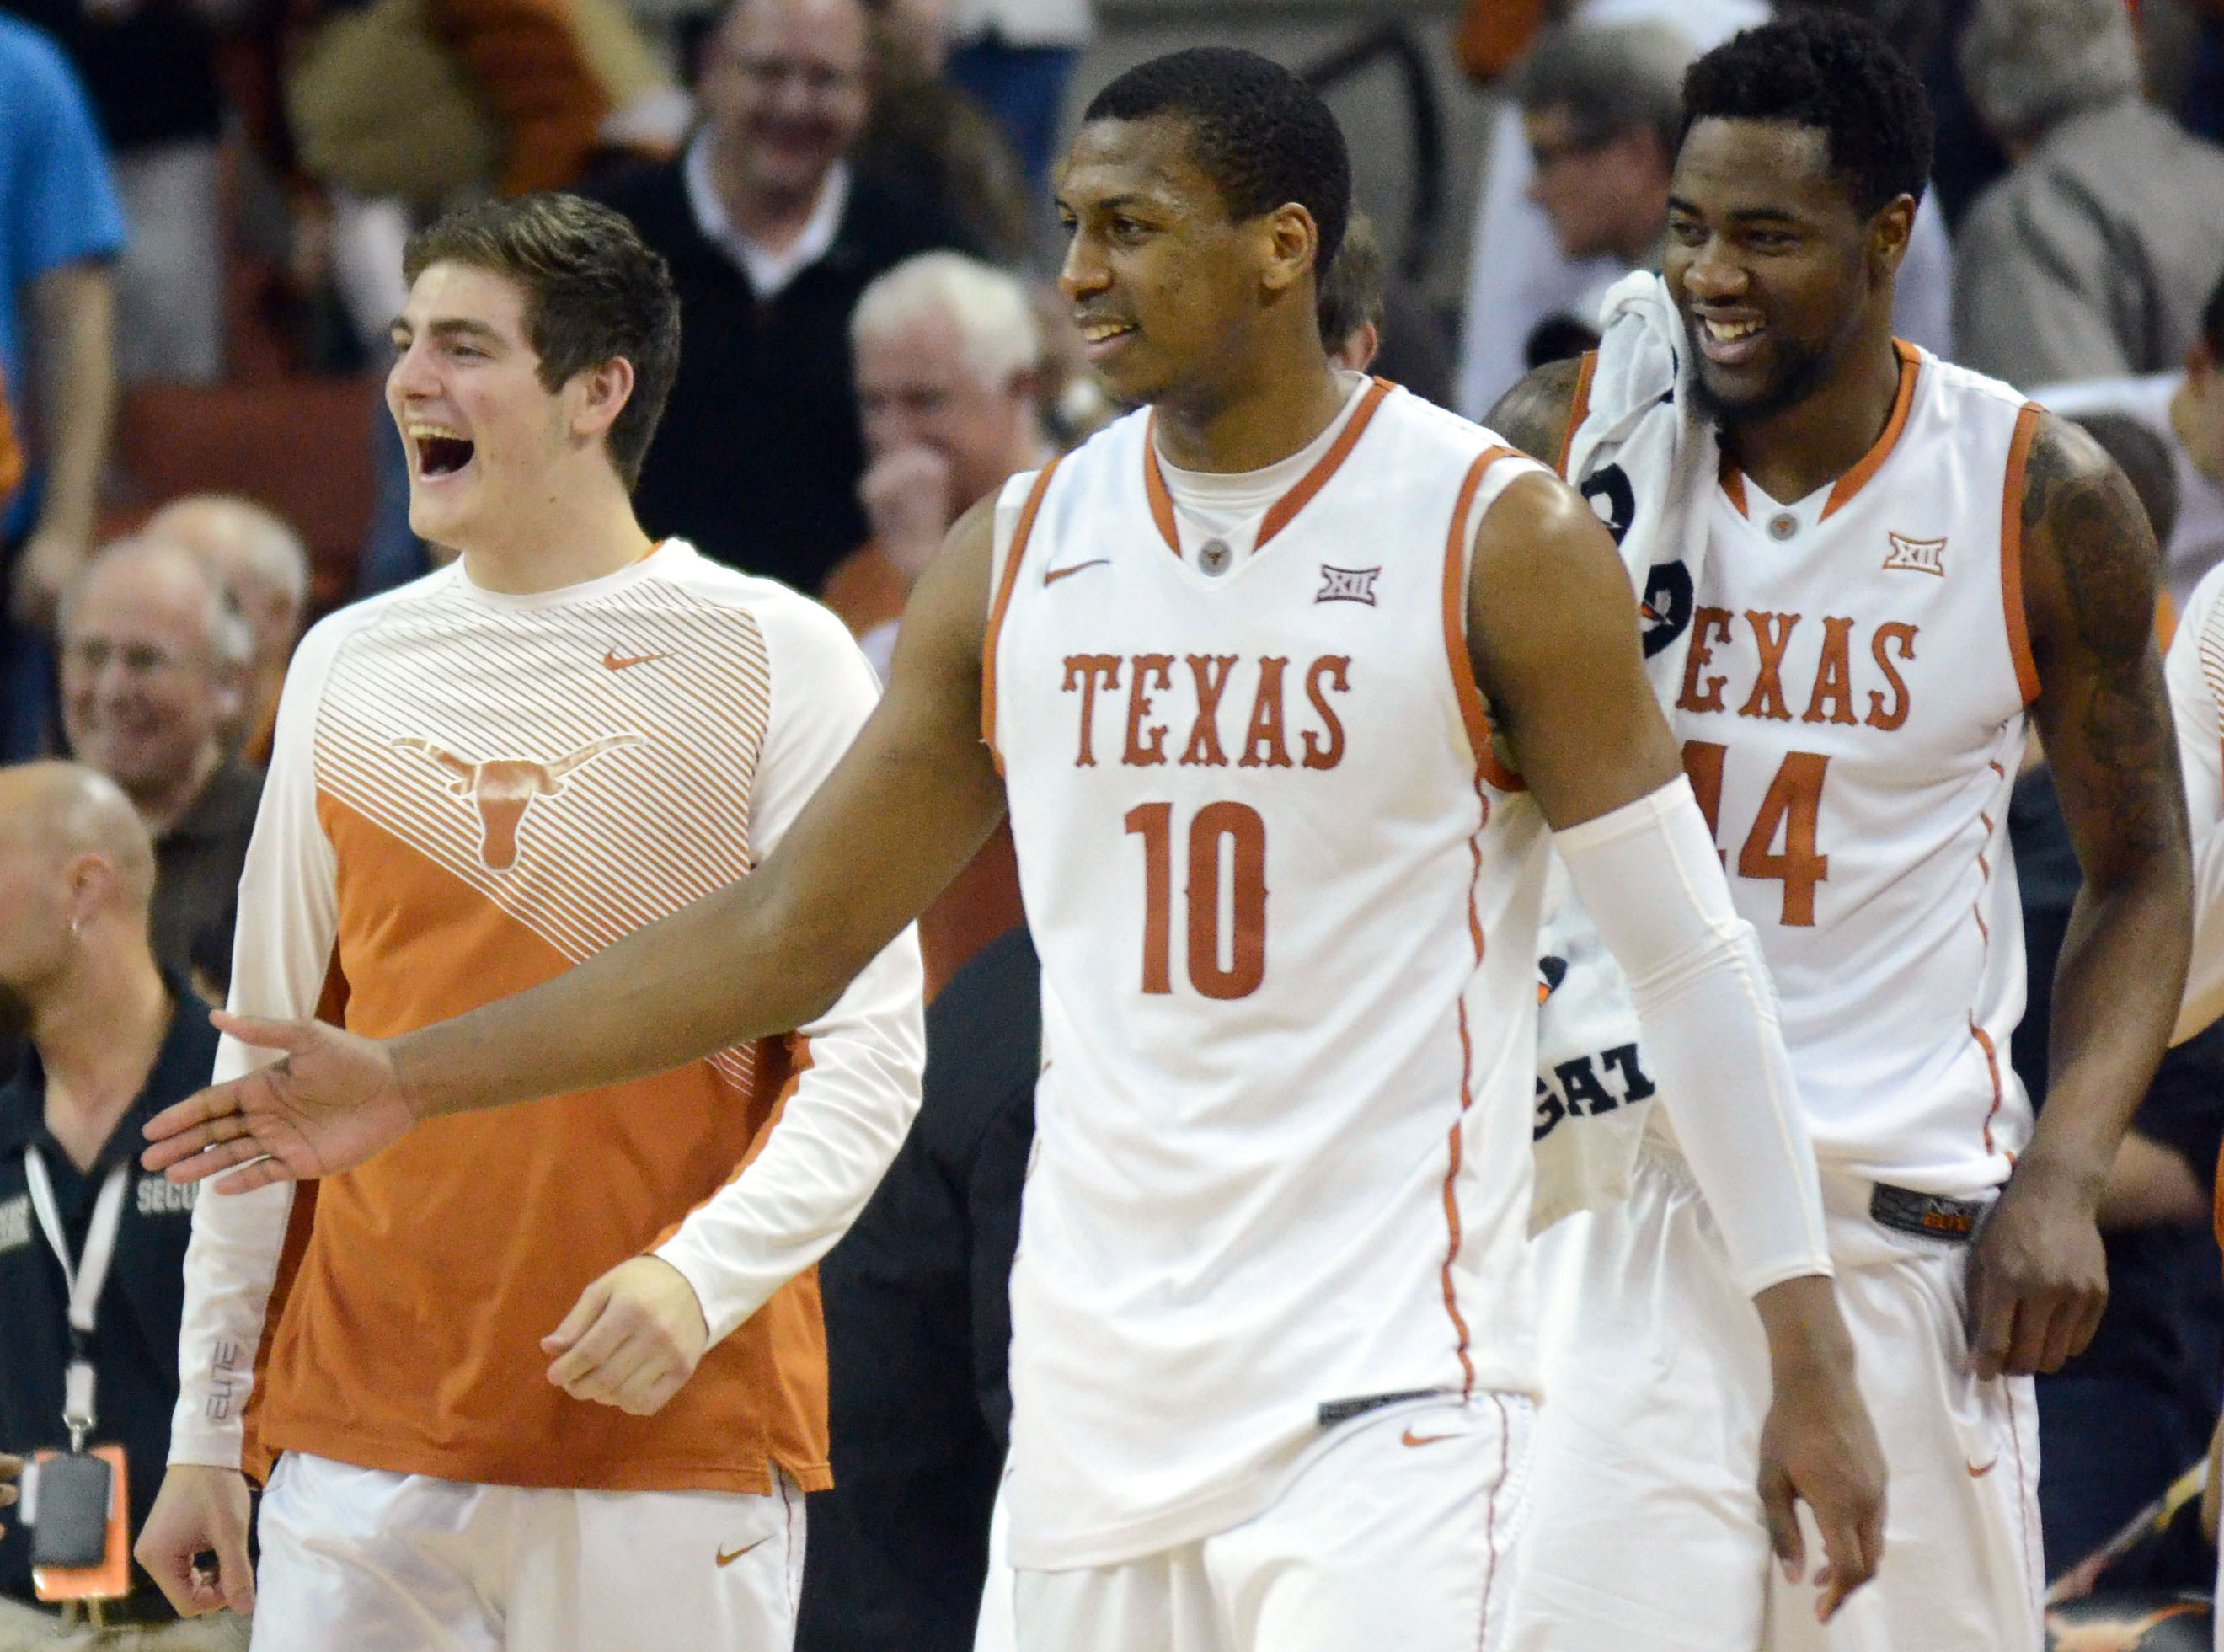 Texas' Jonathan Holmes (center) celebrates a midseason win vs. Kansas State with teammates Ryan McClurg (left) and Prince Ibeh (right). Brendan Maloney / USA TODAY Sports